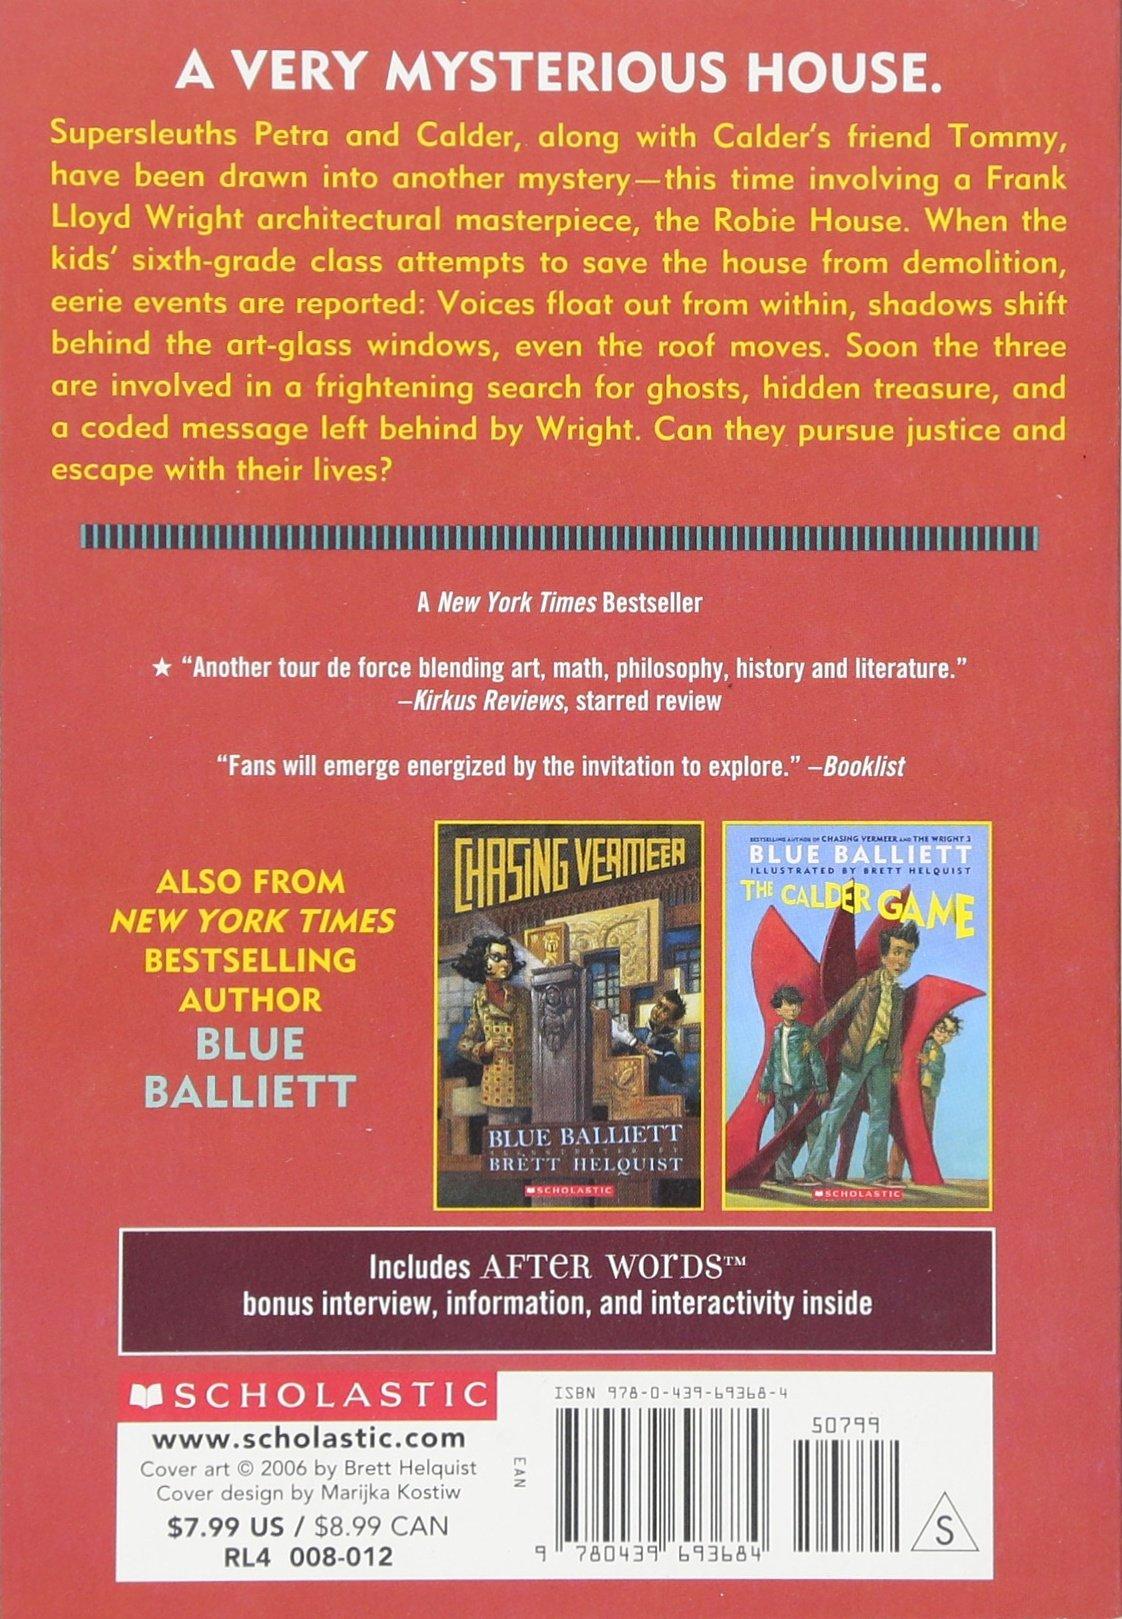 2006 scholastic entertainment inc web site copyright - The Wright 3 Blue Balliett Brett Helquist 9780439693684 Amazon Com Books